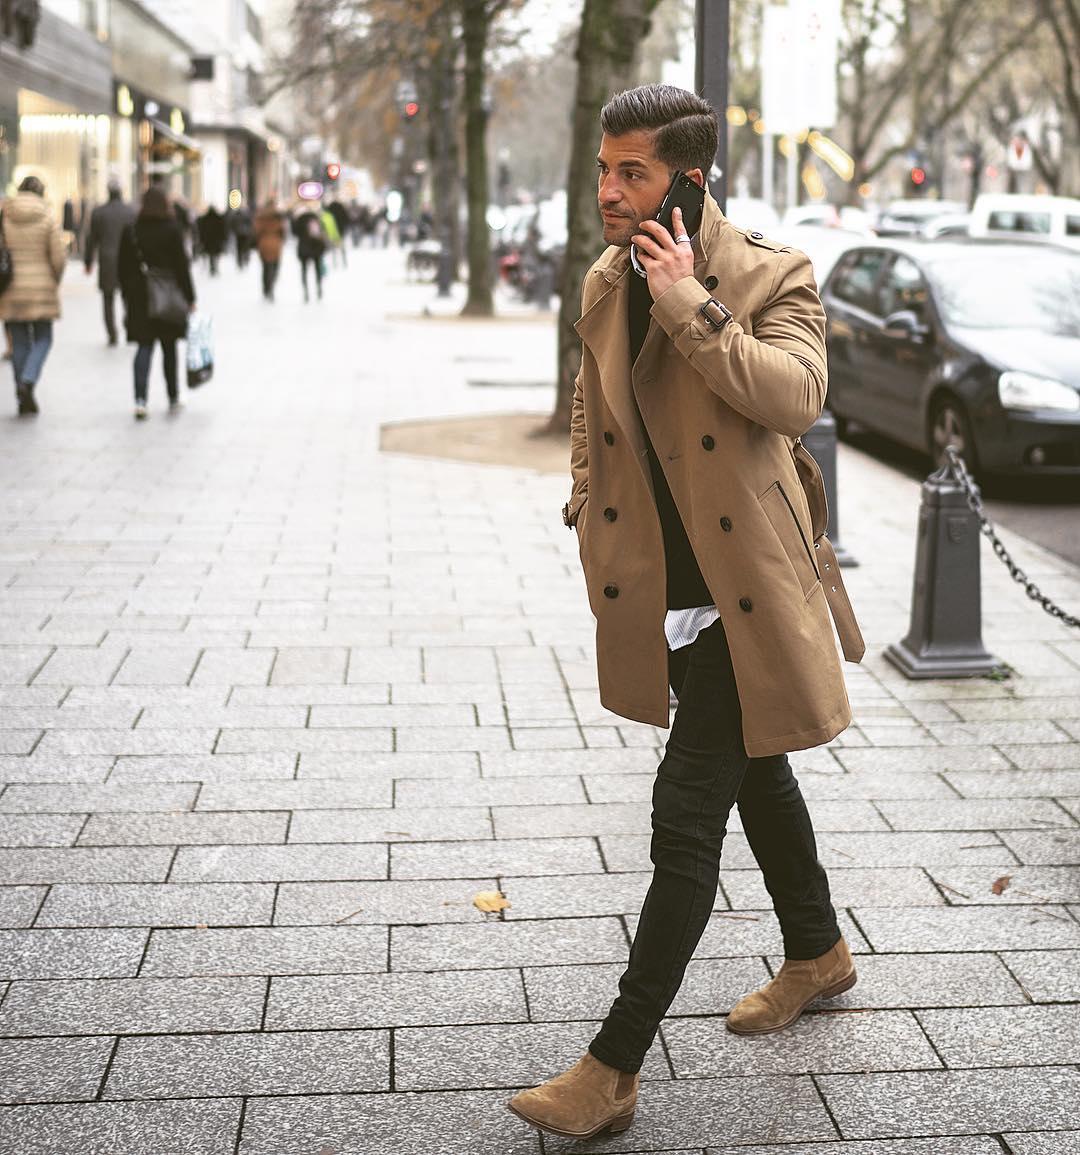 jeans kleden leeftijd MAN MAN